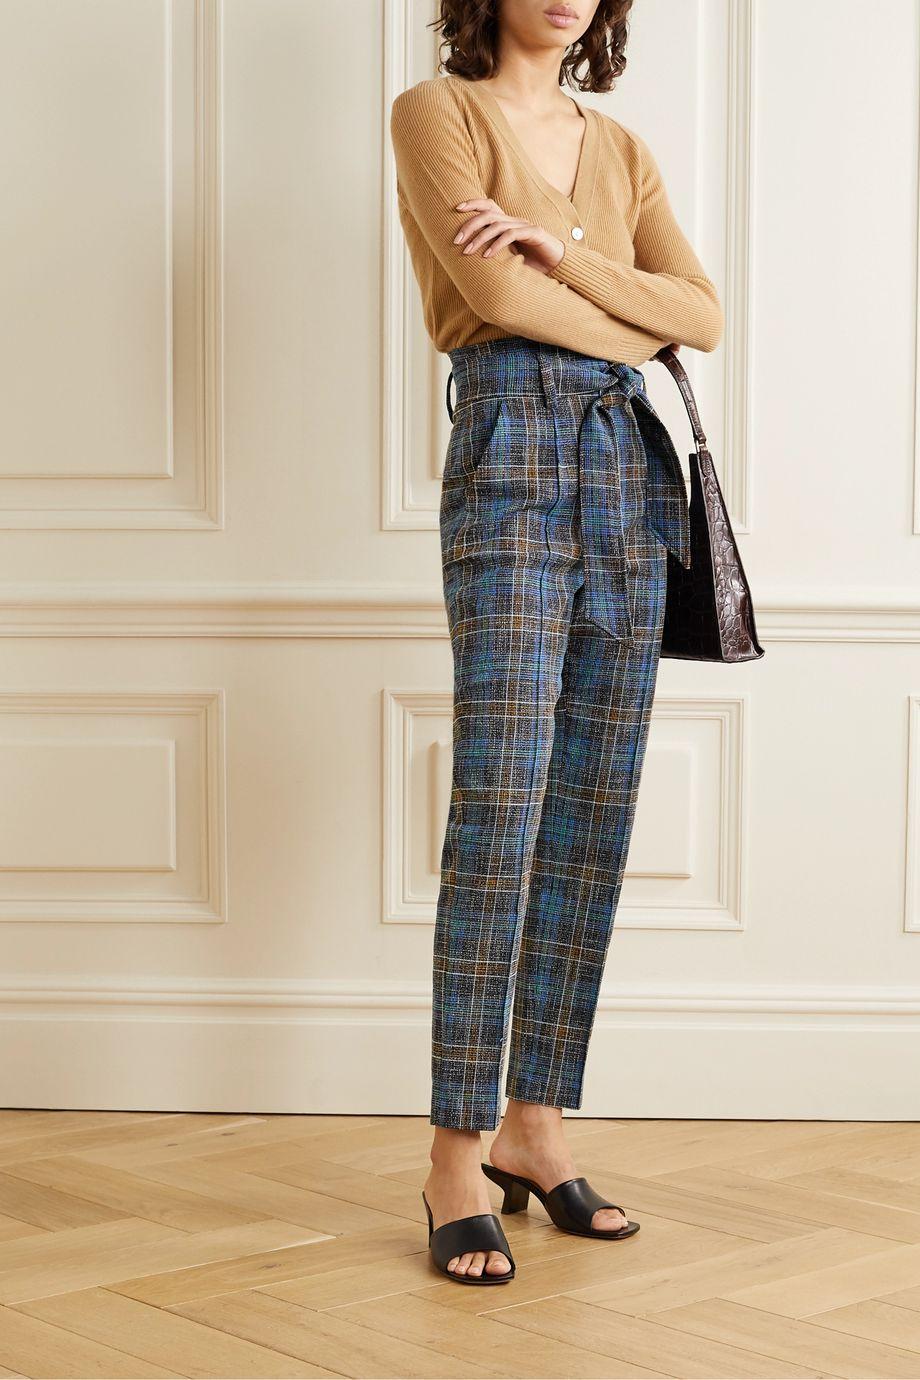 Veronica Beard Pantalon slim tissé à carreaux Clerence